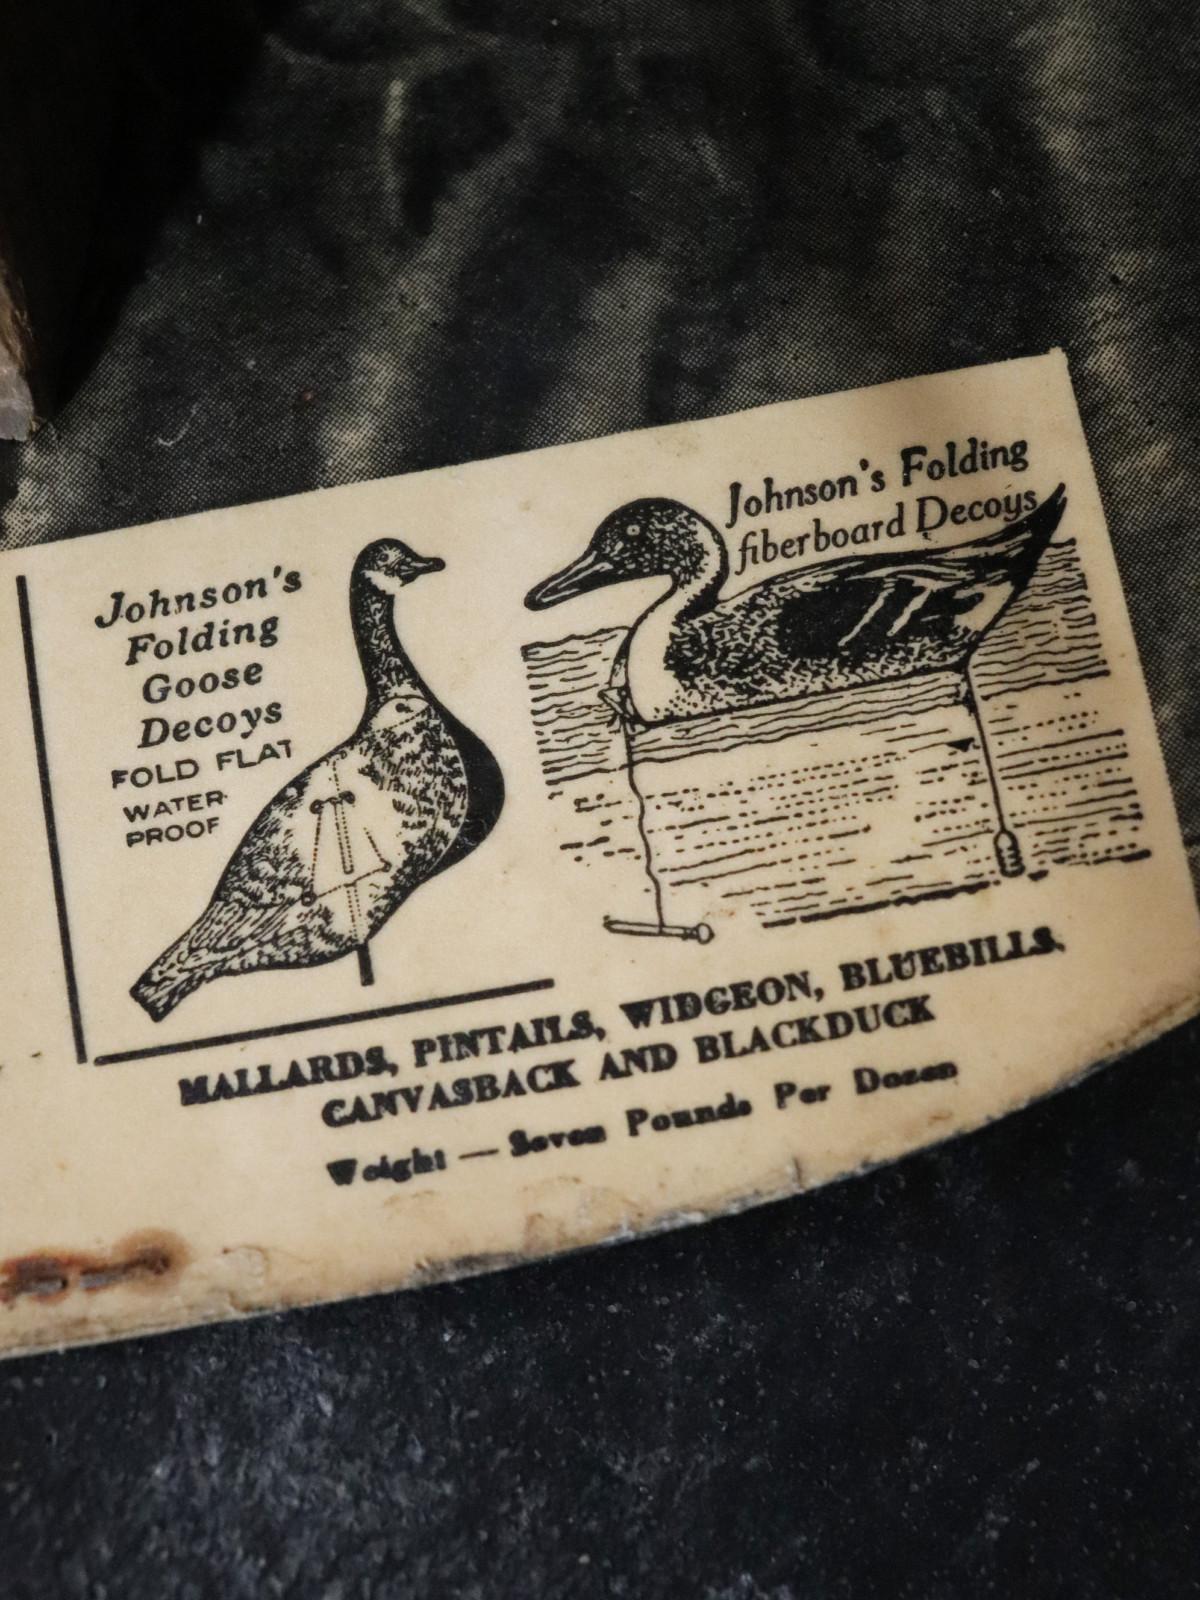 Jonson's,folding goose decoy,usa,vintage